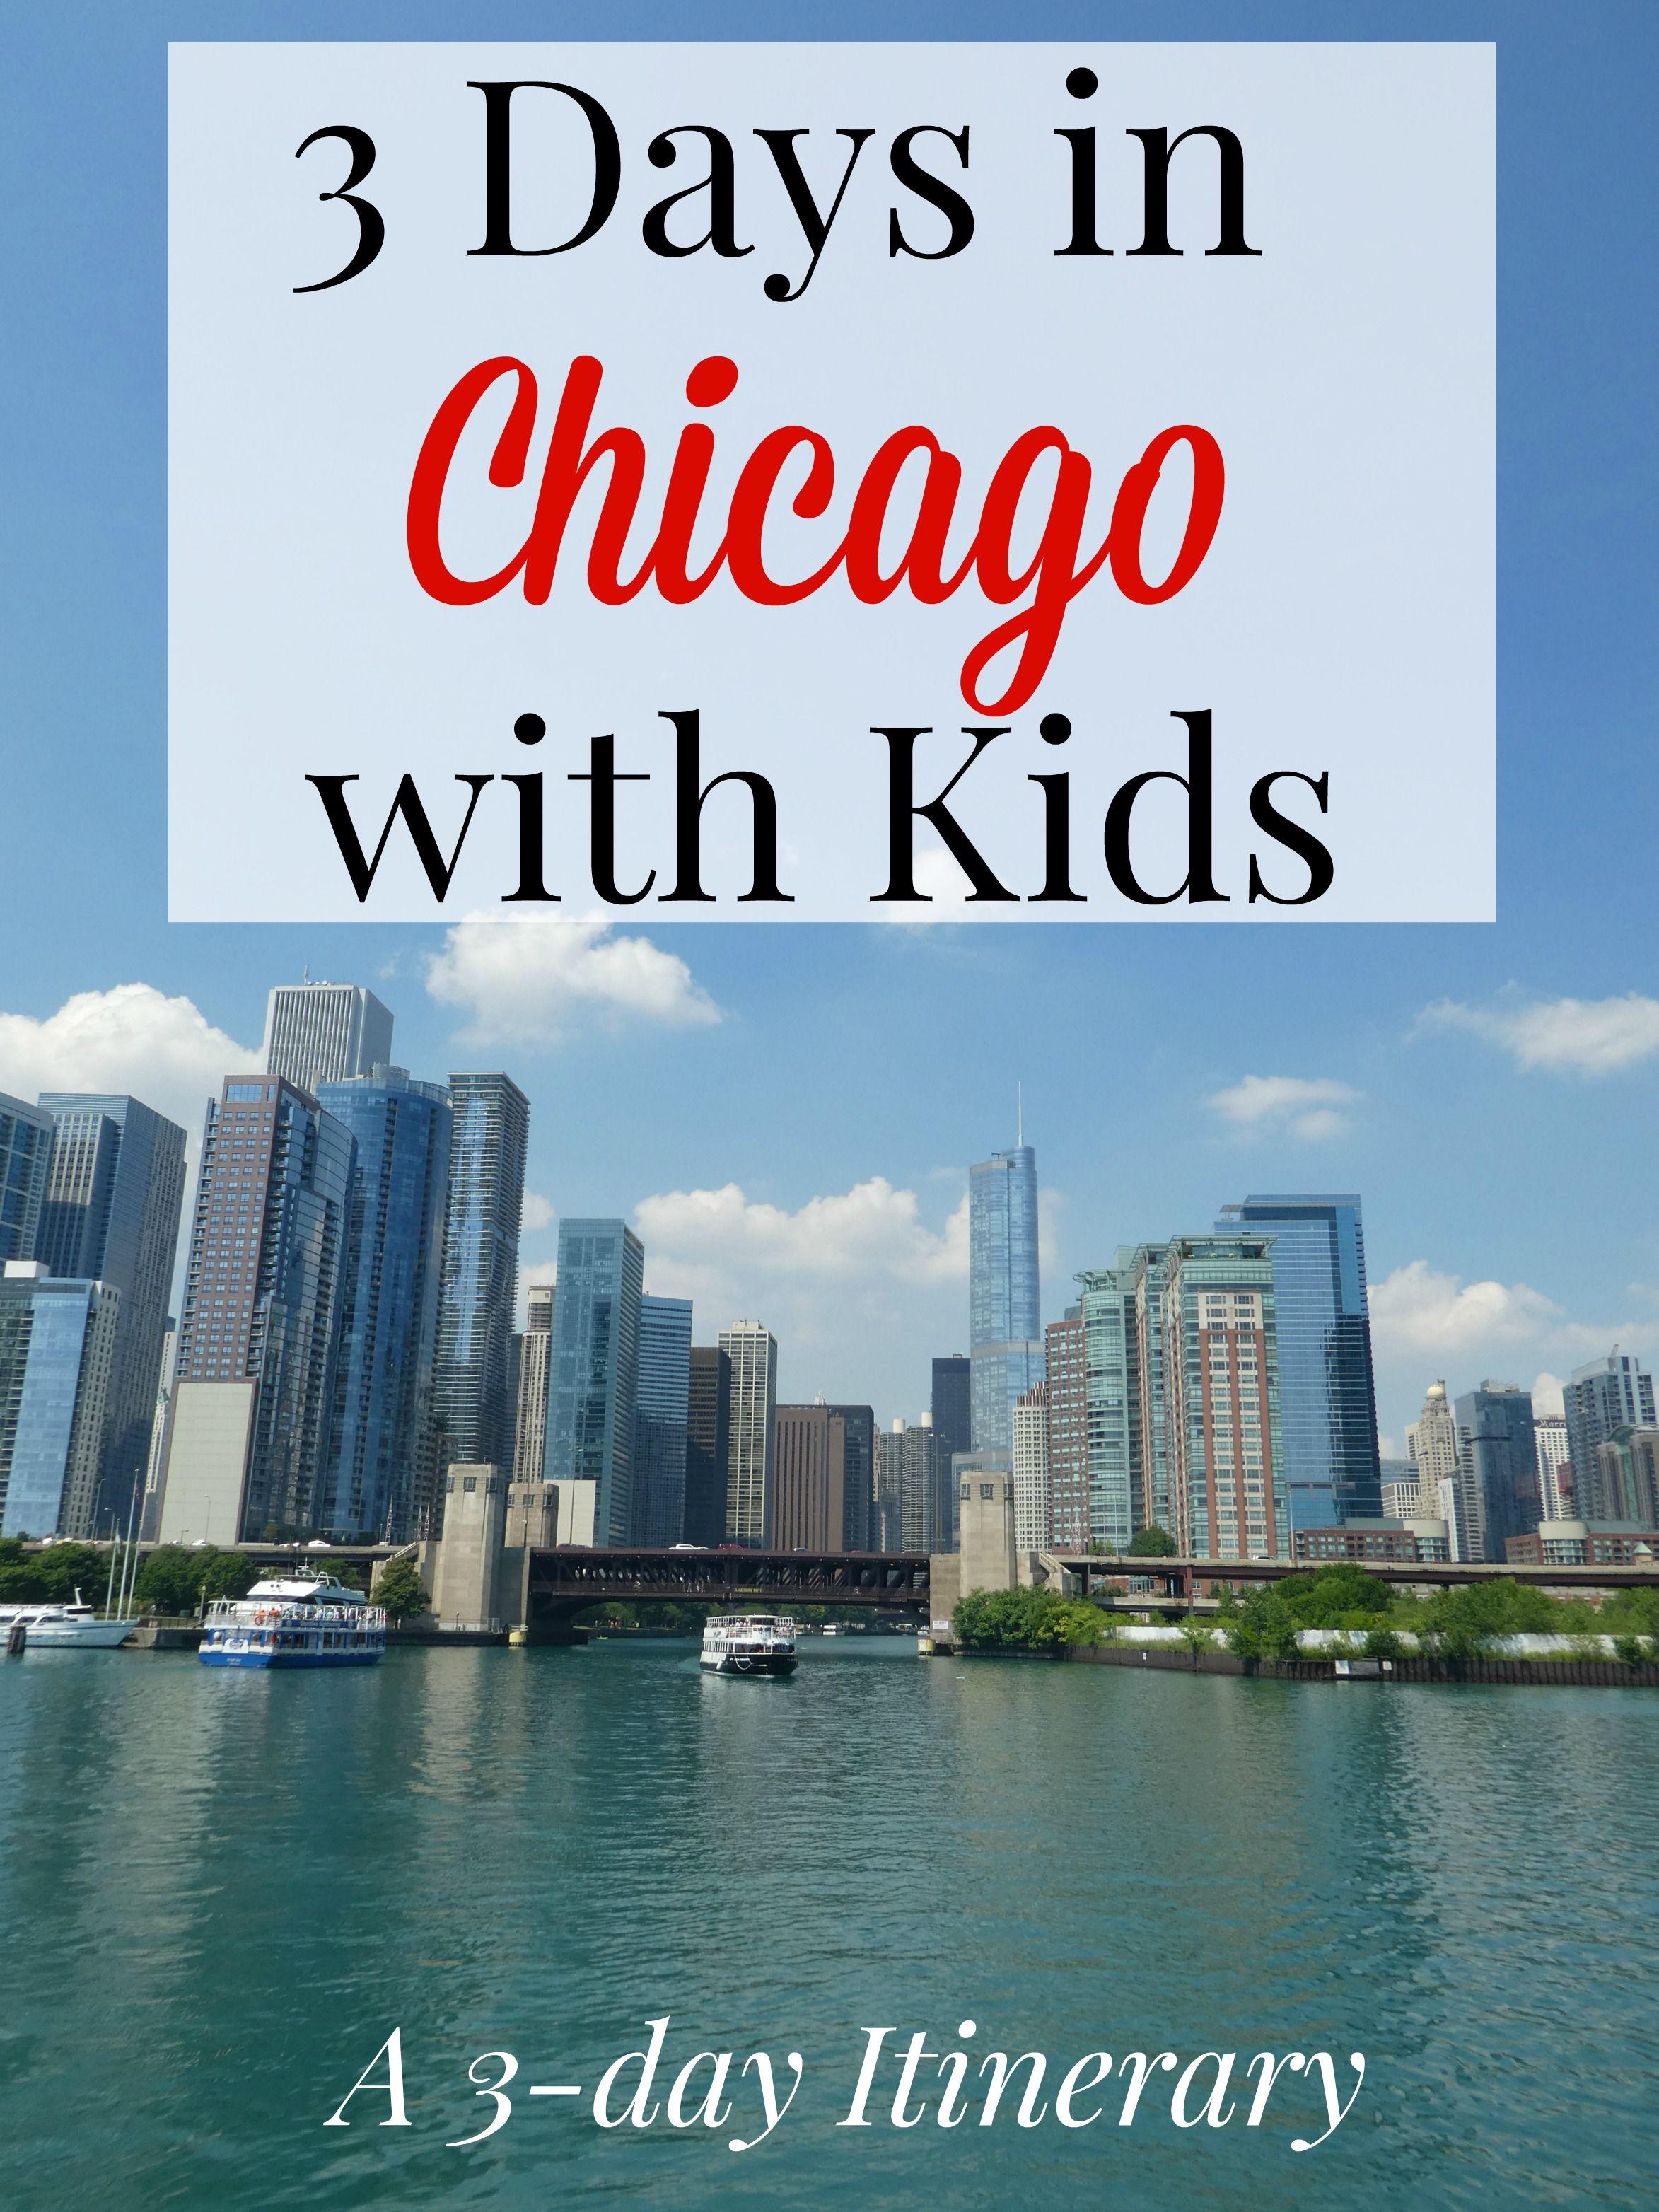 3 days in chicago with kids   chicago   pinterest   chicago travel